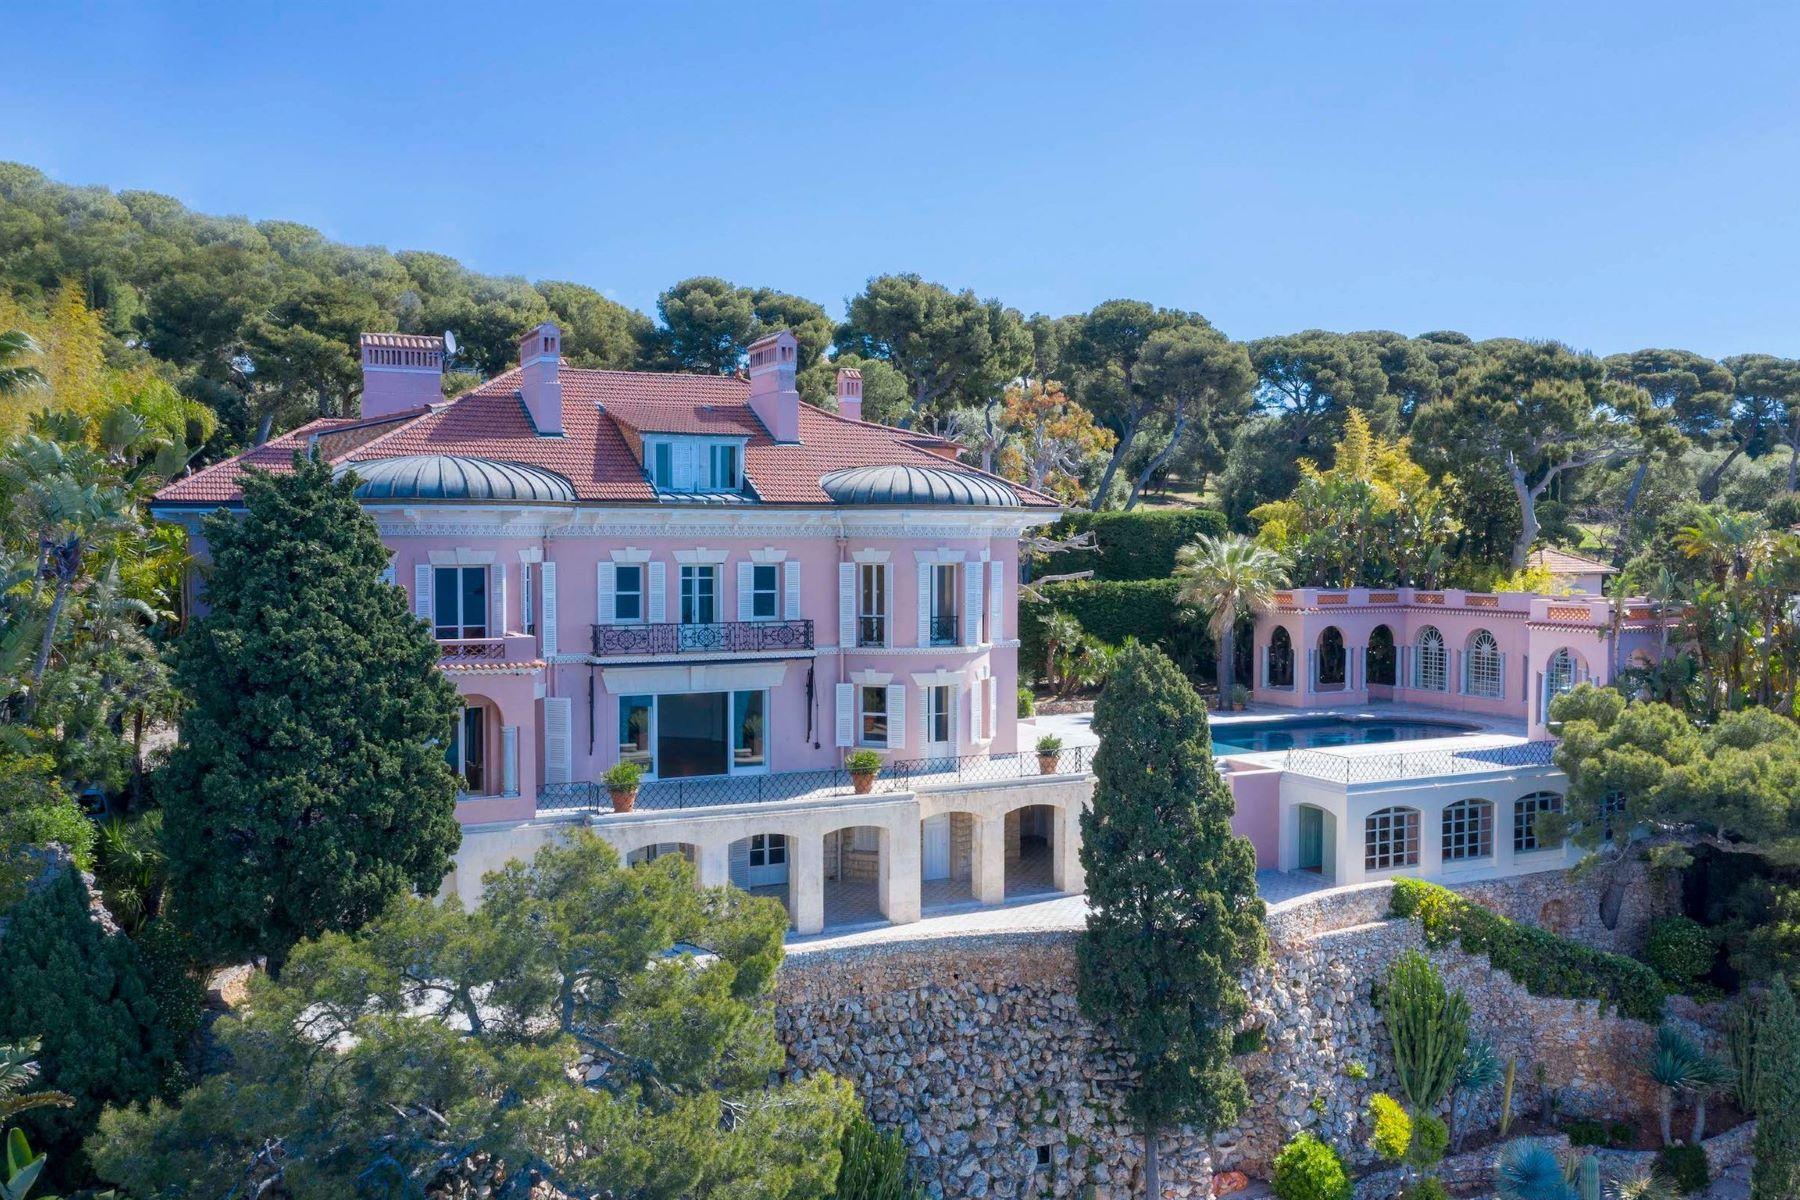 Single Family Homes for Sale at Property Roquebrune Cap Martin, Provence-Alpes-Cote D'Azur 06190 France